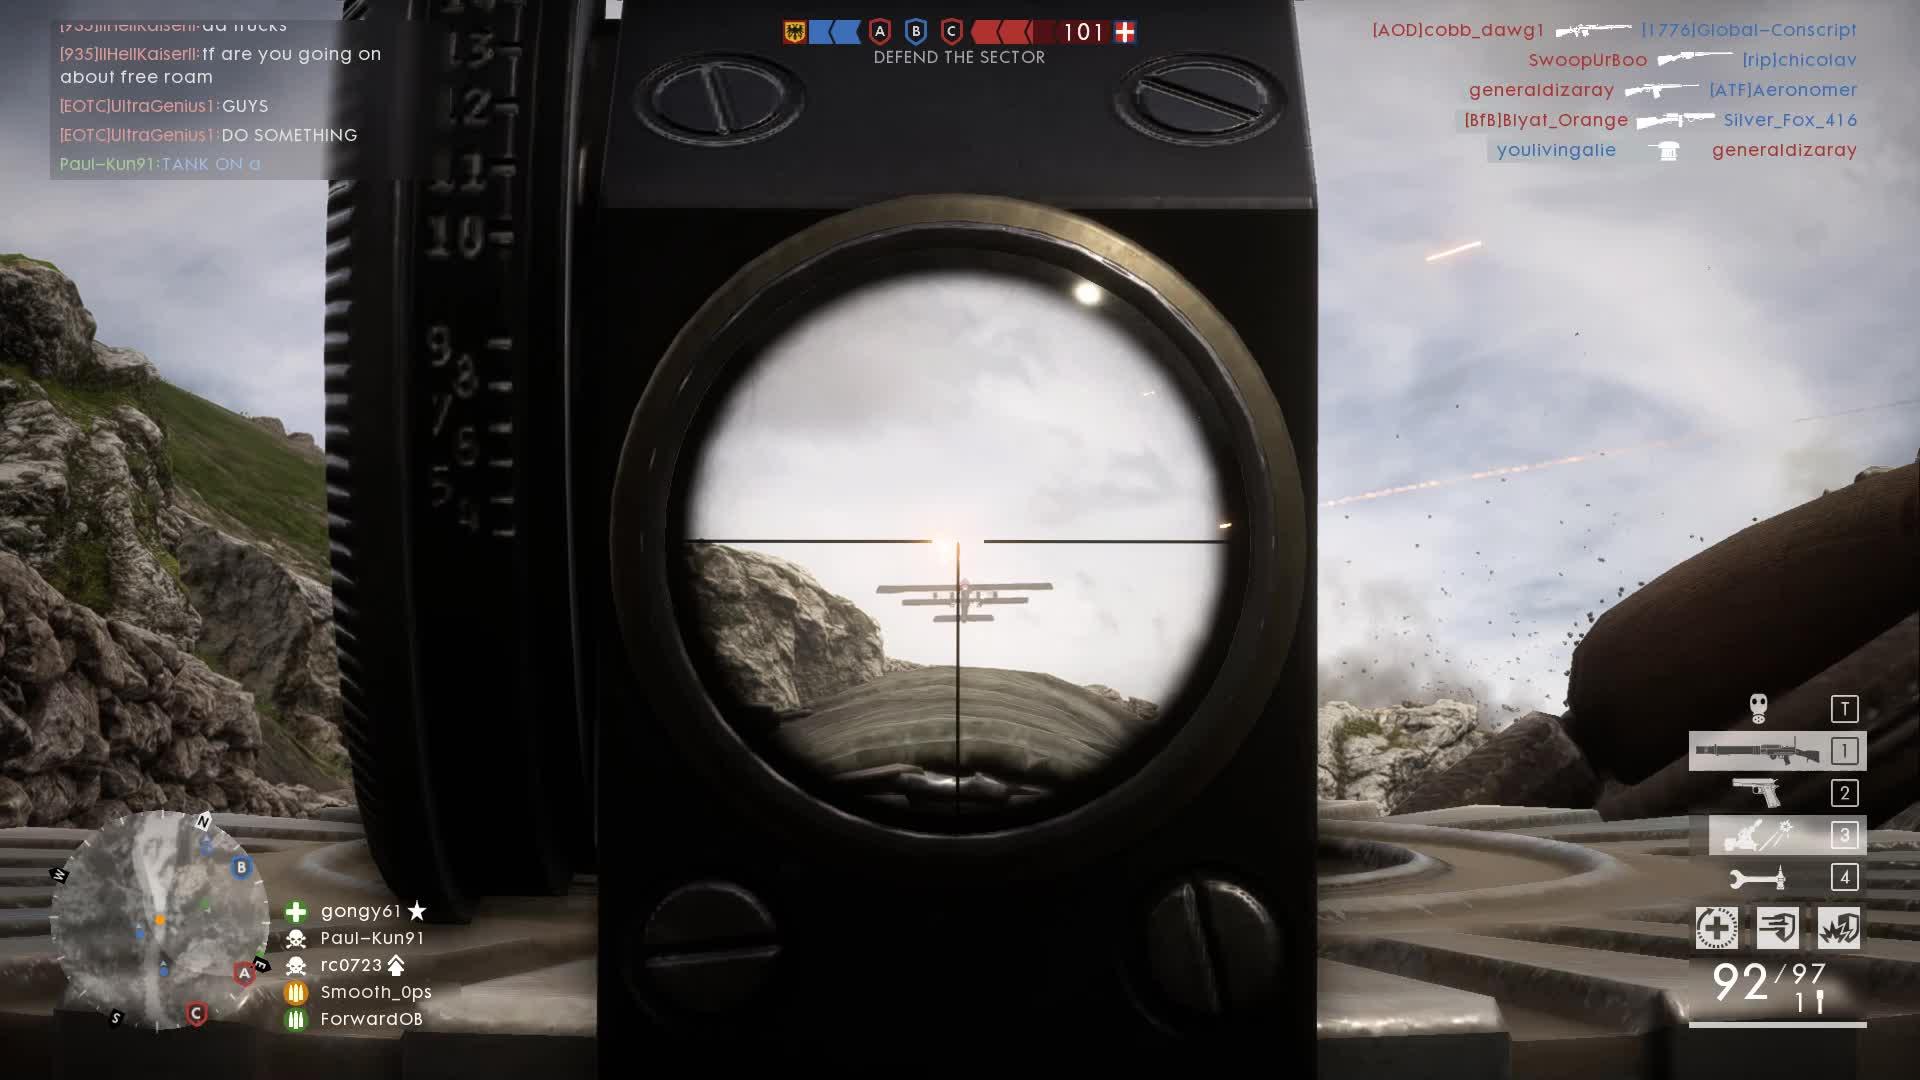 battlefield1, vlc-record-2018-07-01-01h37m46s-Battlefield 1 2018.06.29 - 20.54.44.02.DVR.mp4- GIFs